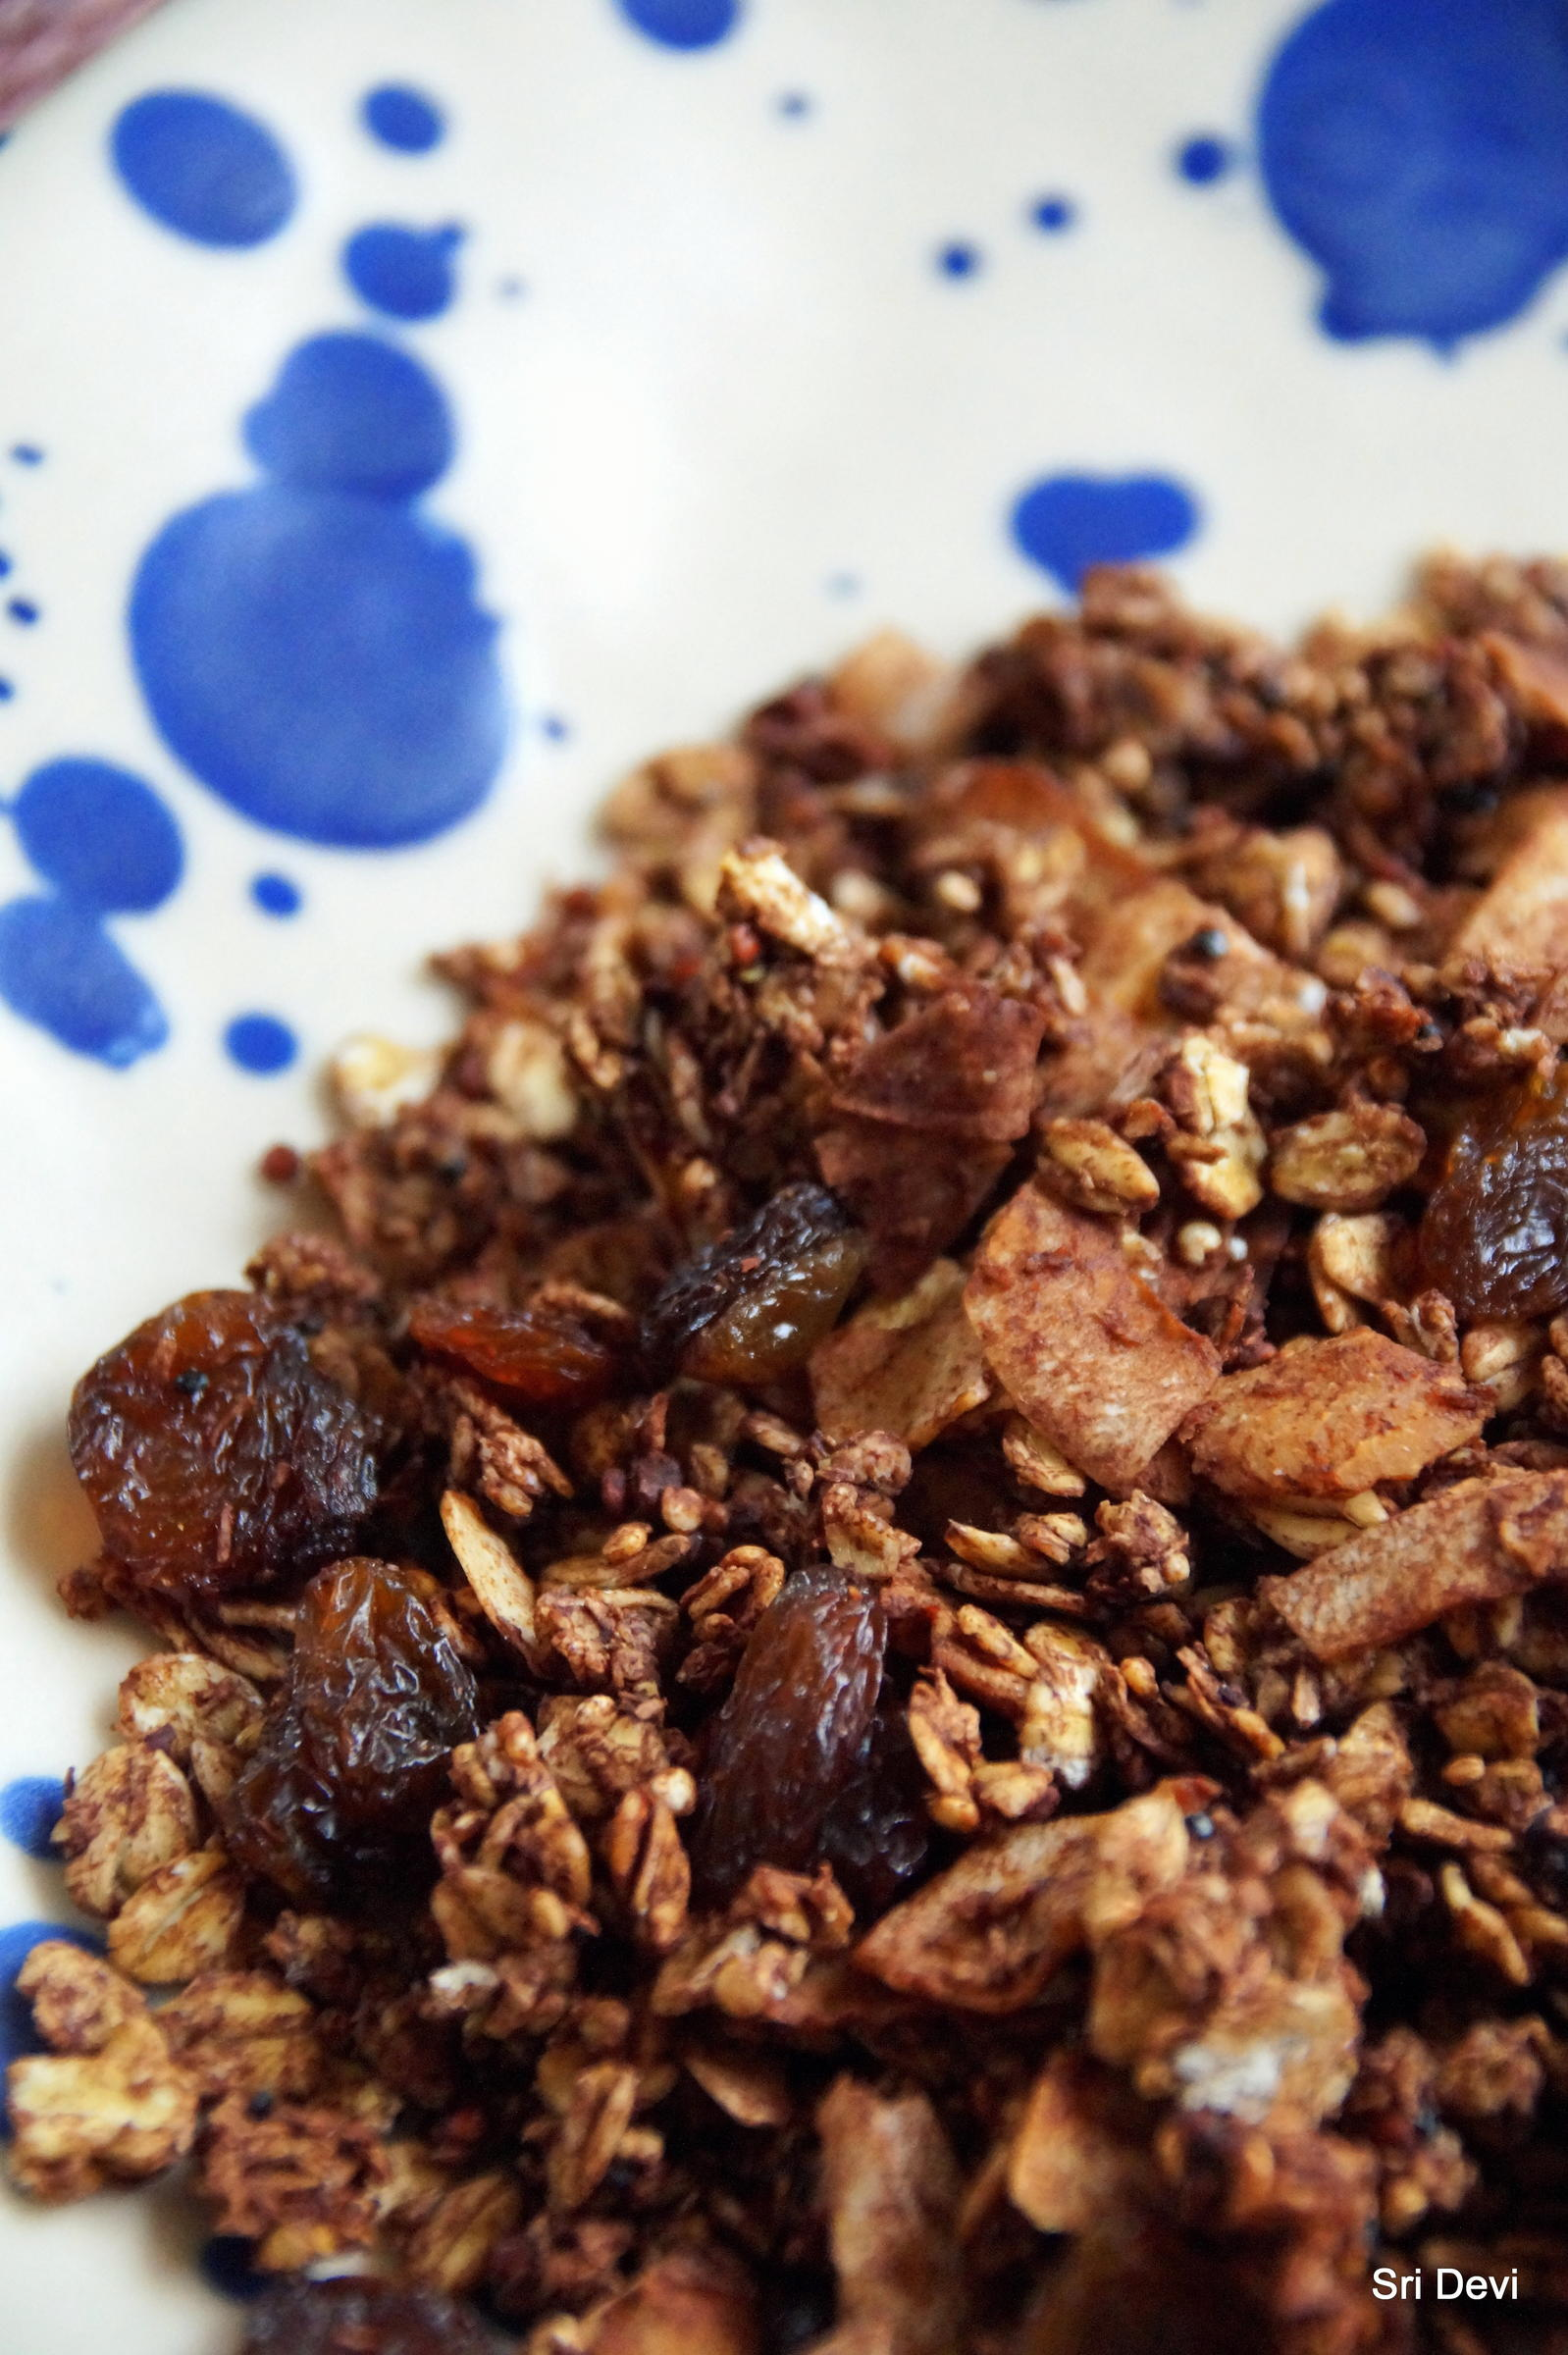 Frühstück: Kokos-Schoko-Granola - Rezept Gesendet von Sri_Devi